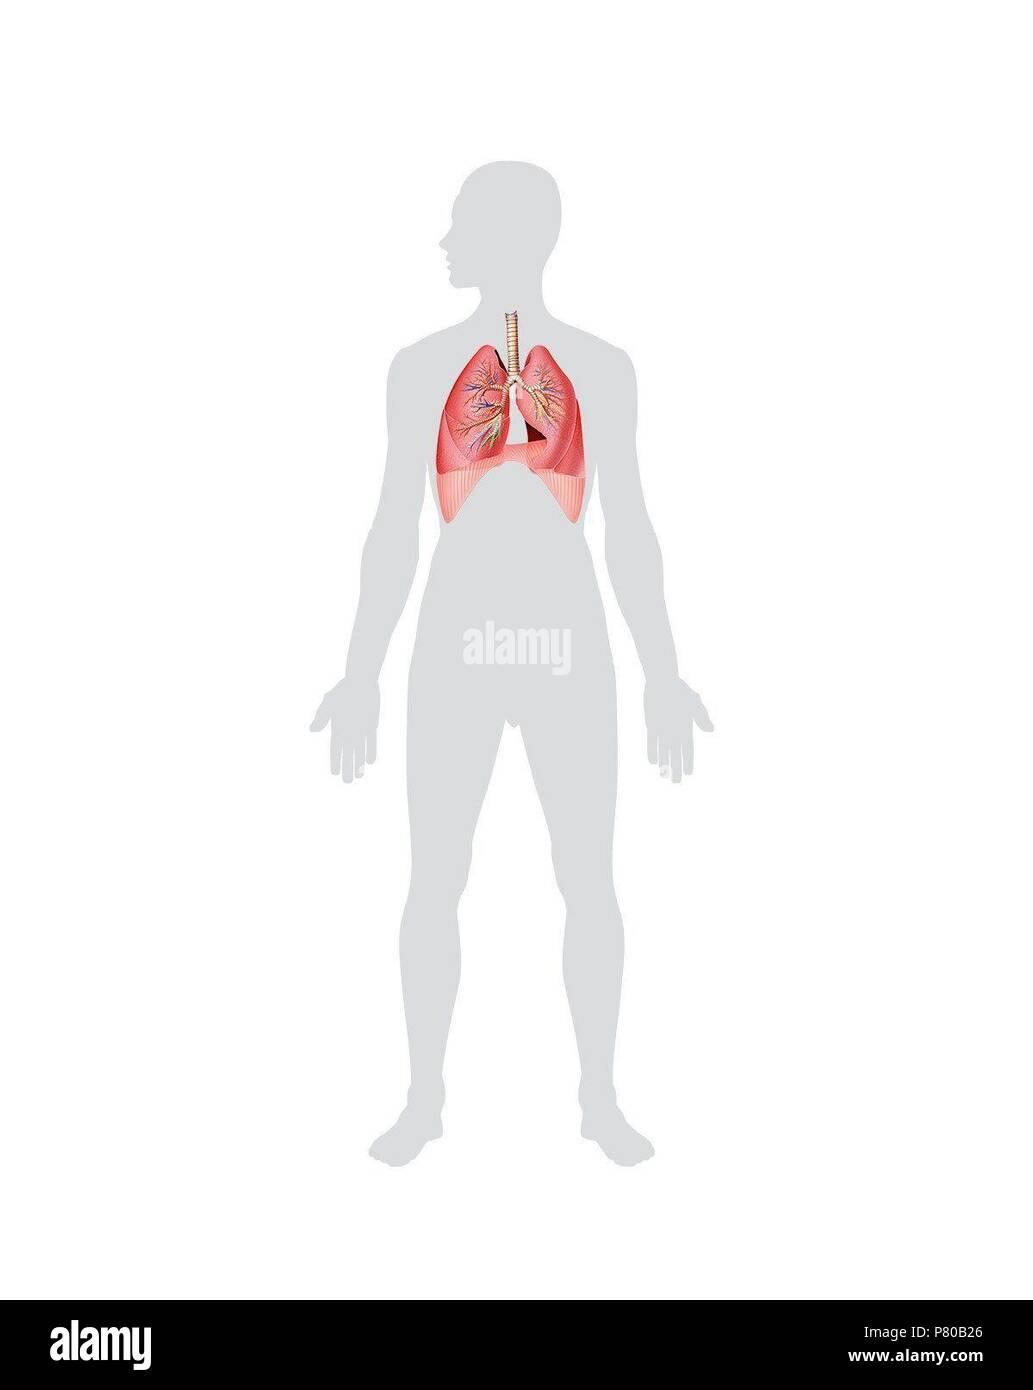 Respiratory System Lower Respiratory Tract Stock Photo 211450350